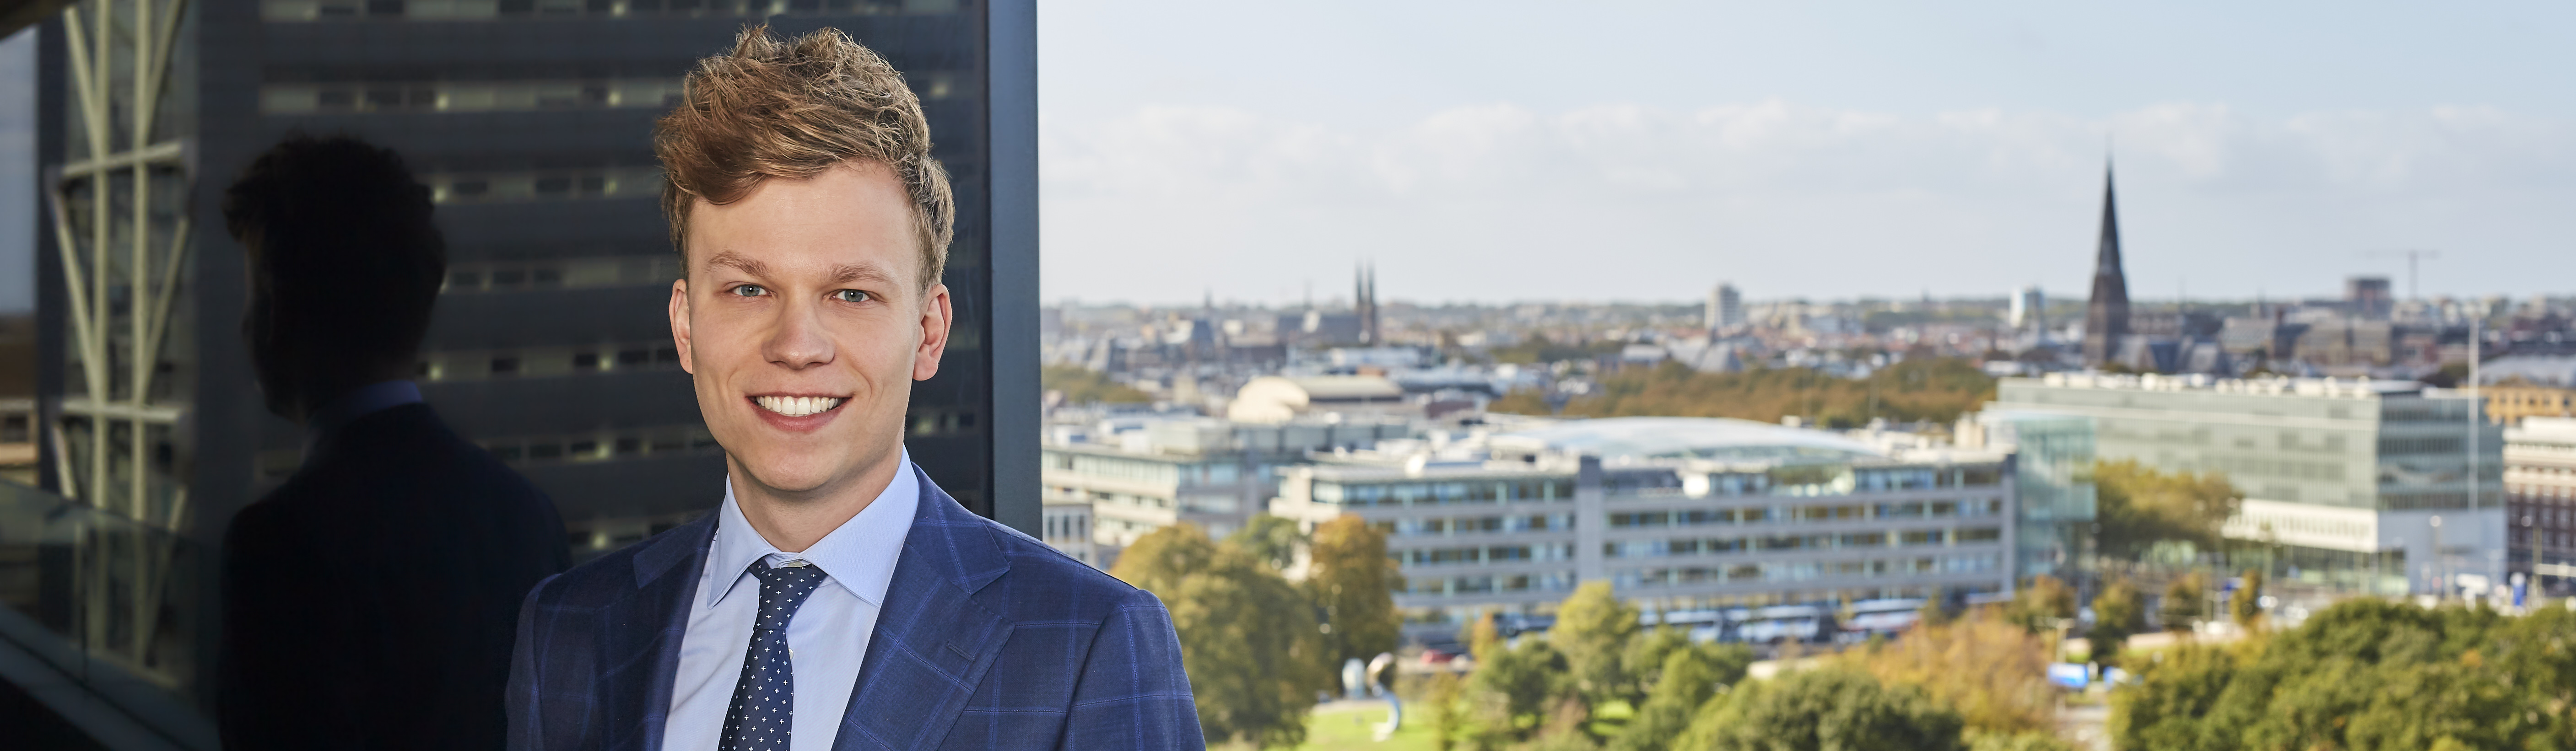 Luuk Sieverink, advocaat Pels Rijcken